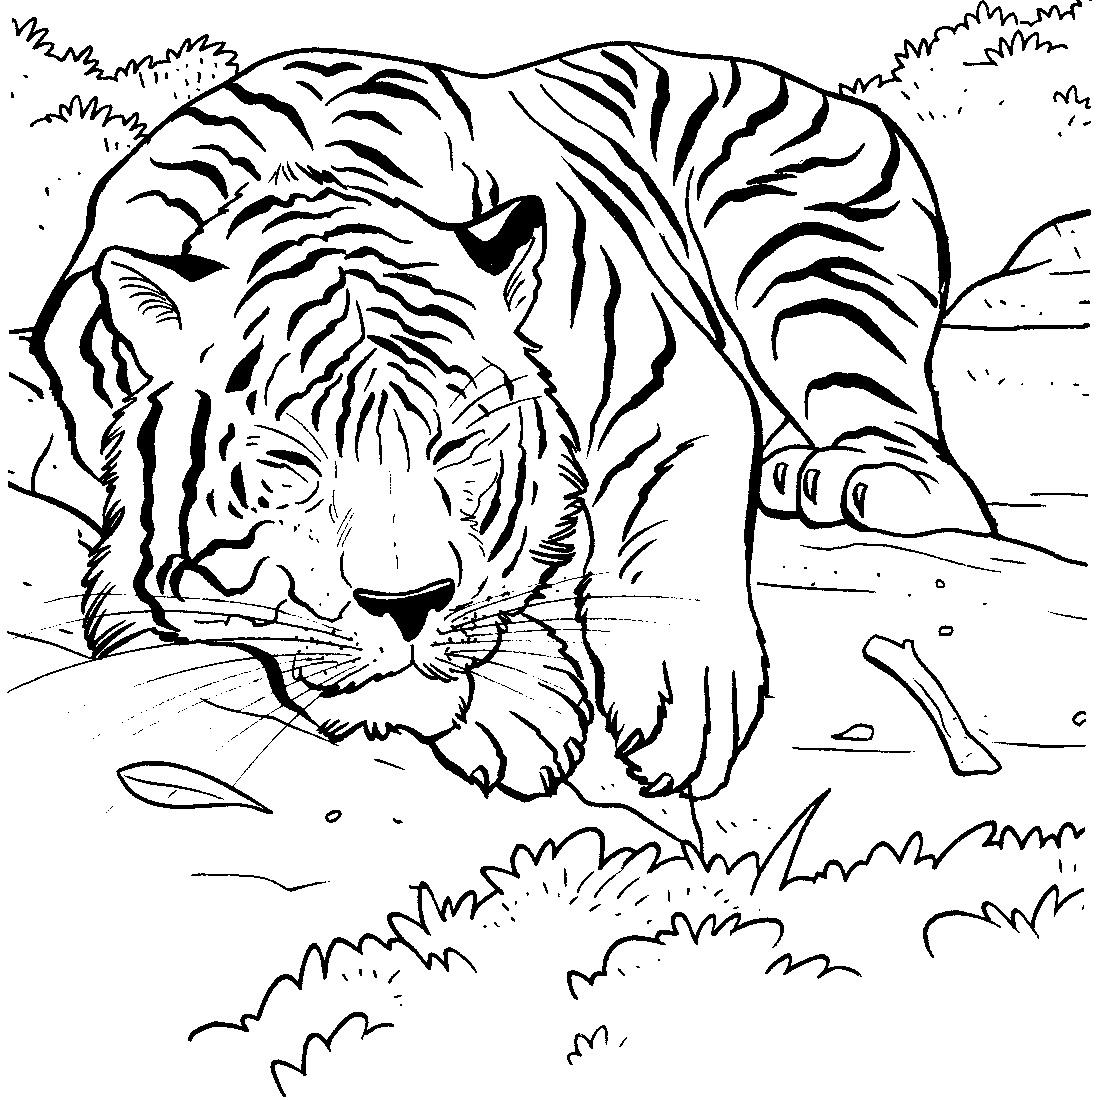 Martias Db21 Gambar Mewarnai Harimau Sumatera